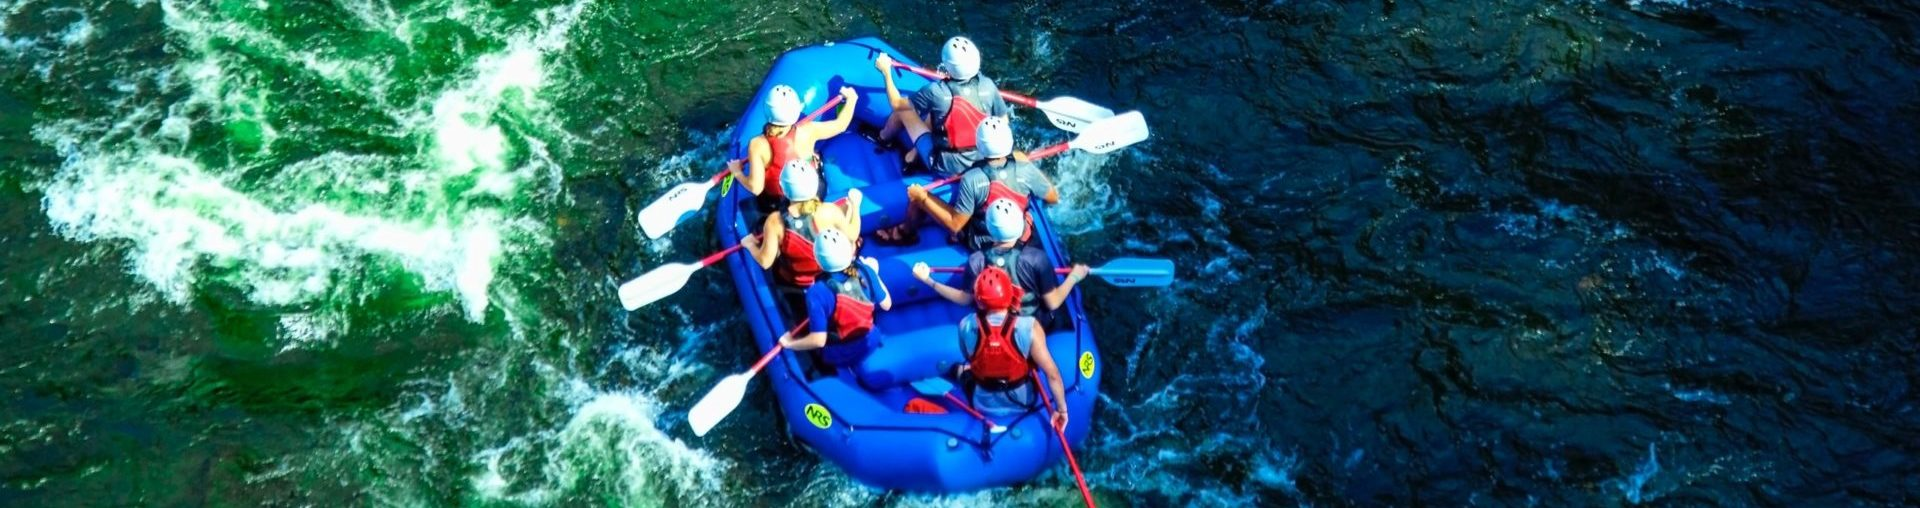 Rafting 100 km Grand kamp Tara